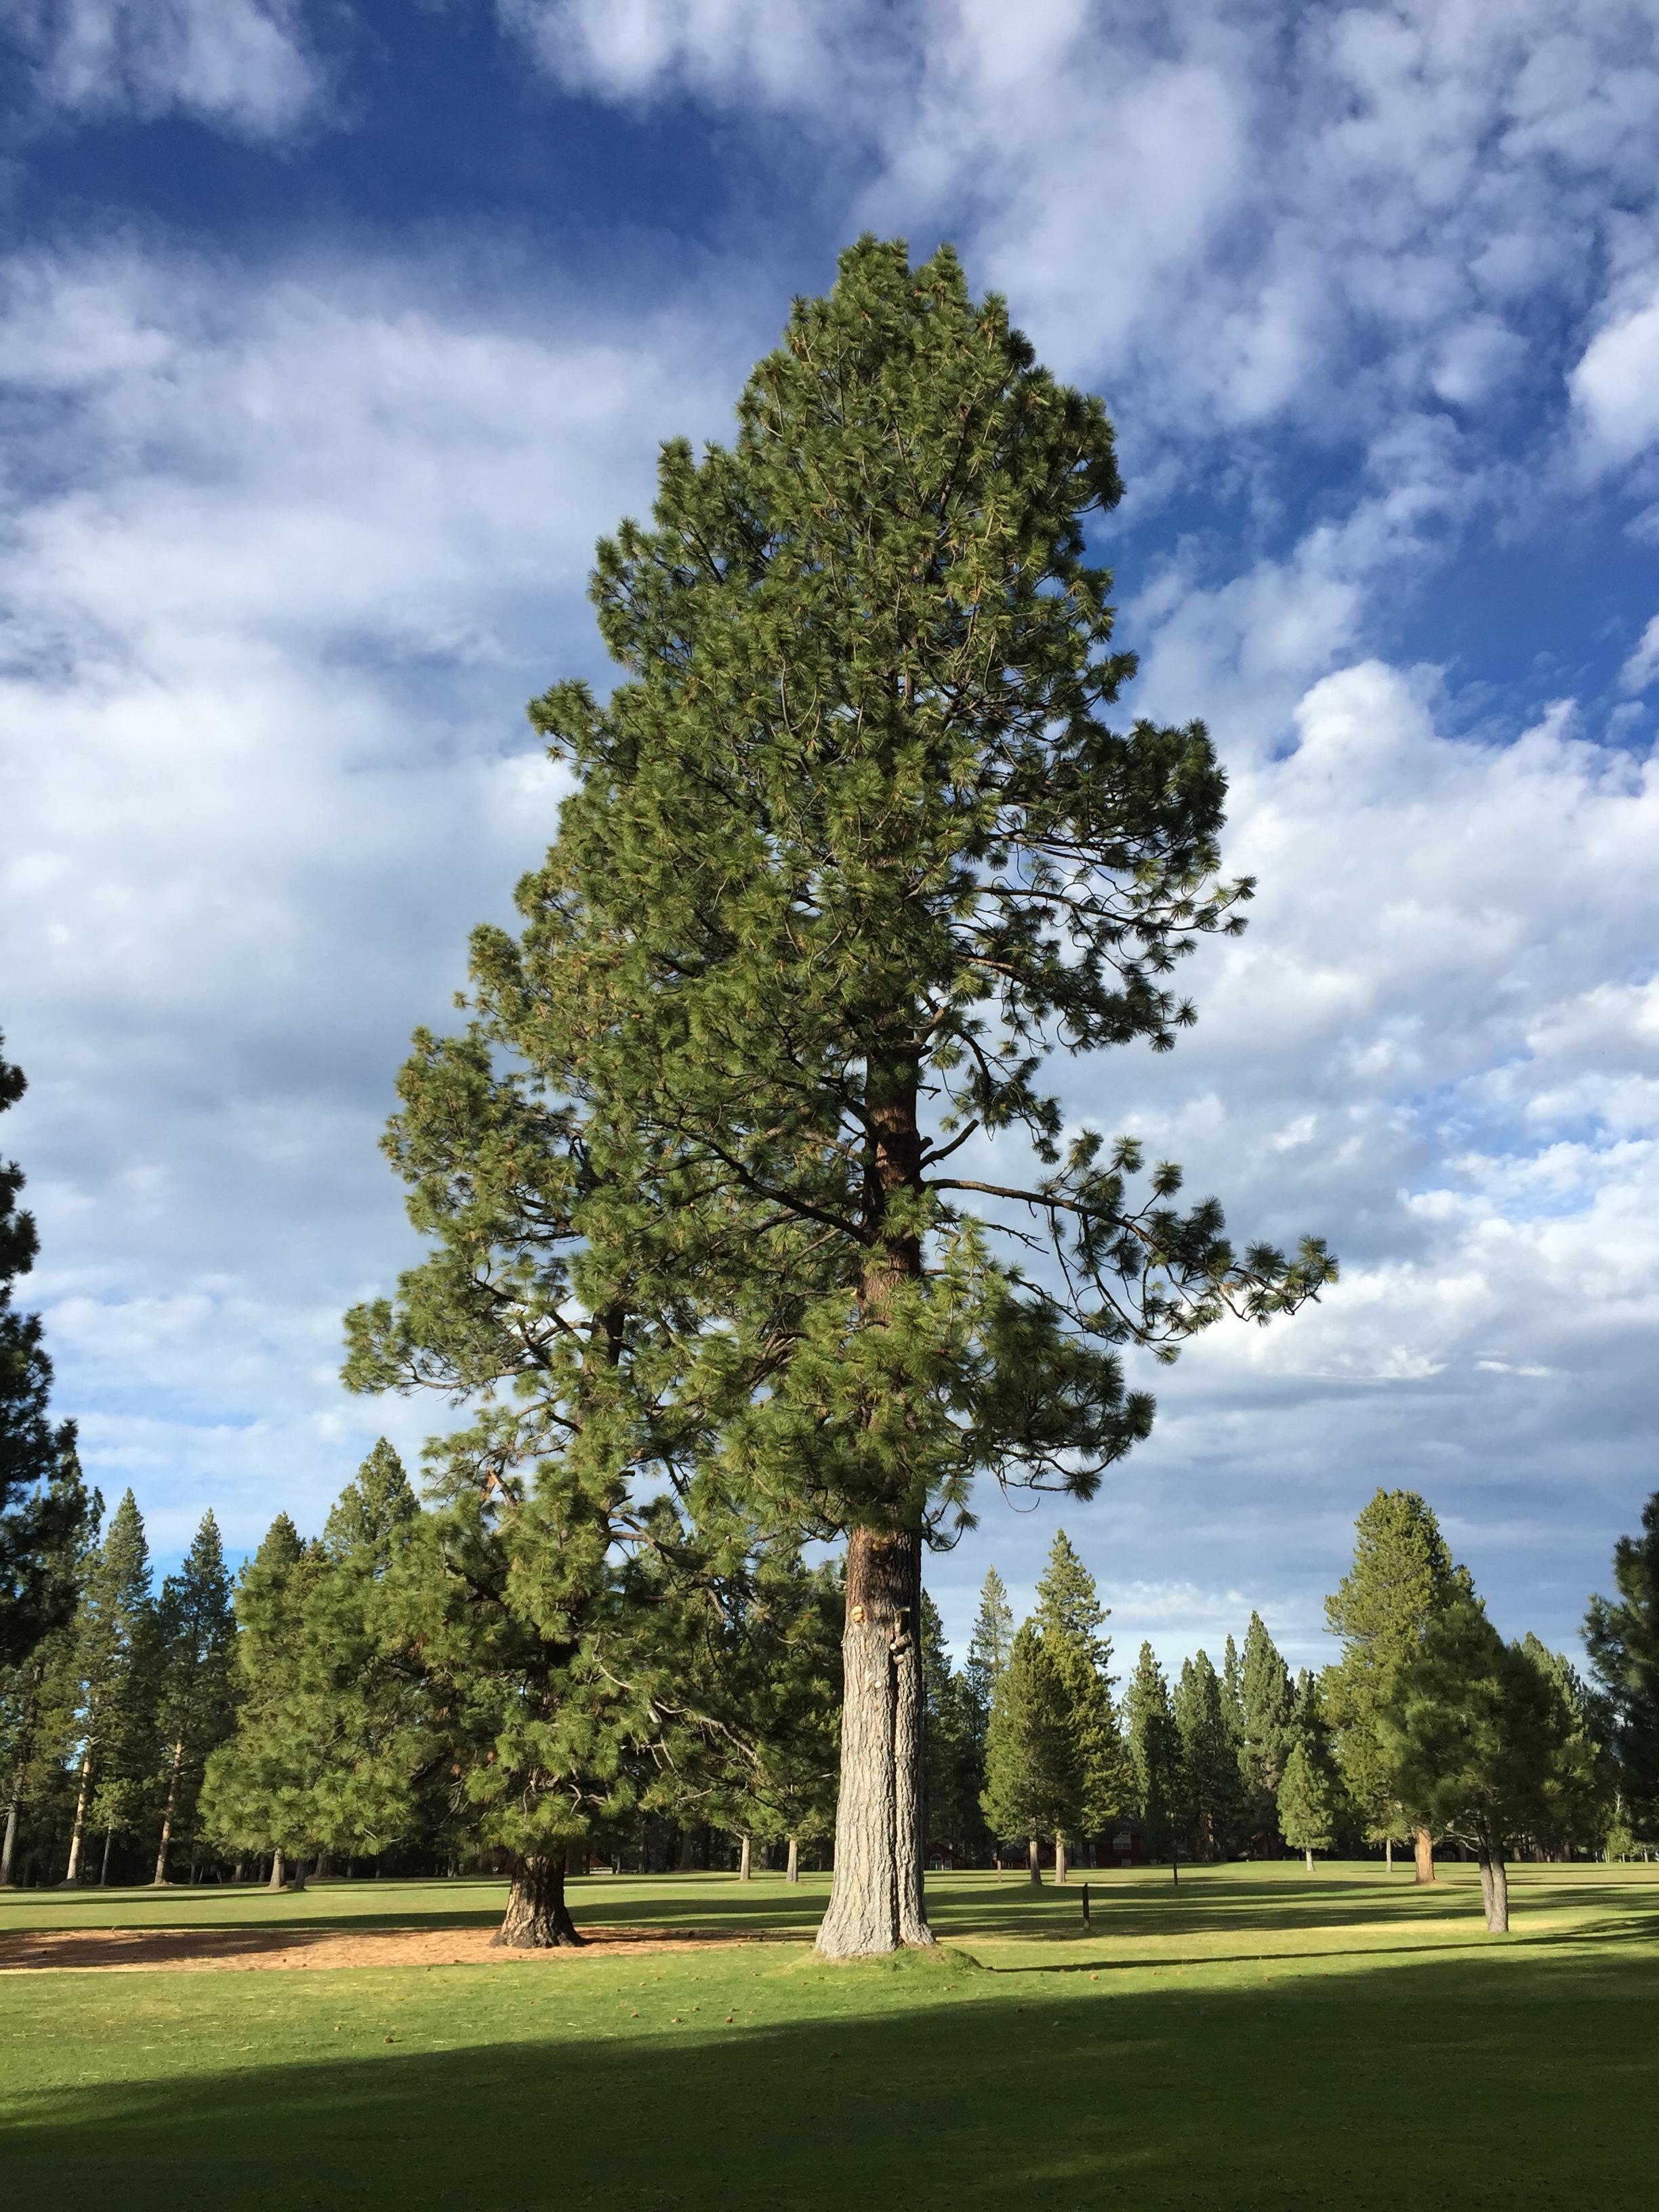 Large Image For Asclepias Incarnata Swamp Milkweed: File:2015-10-30 16 33 04 Large Pine Tree At The Ponderosa